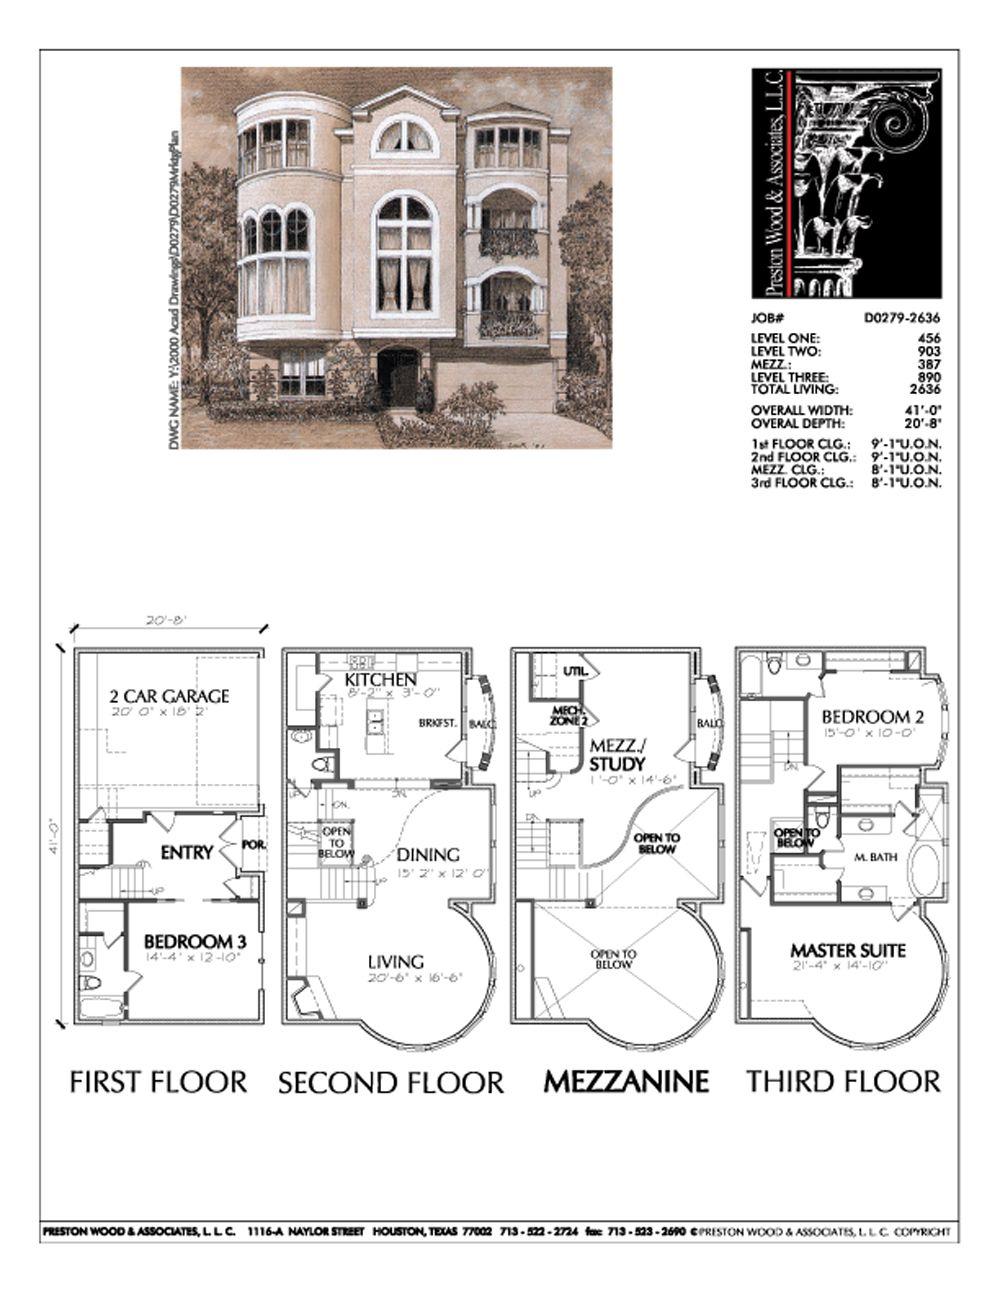 Townhouse Plan D0279 | Pinterest | Townhouse, Mezzanine floor and ...